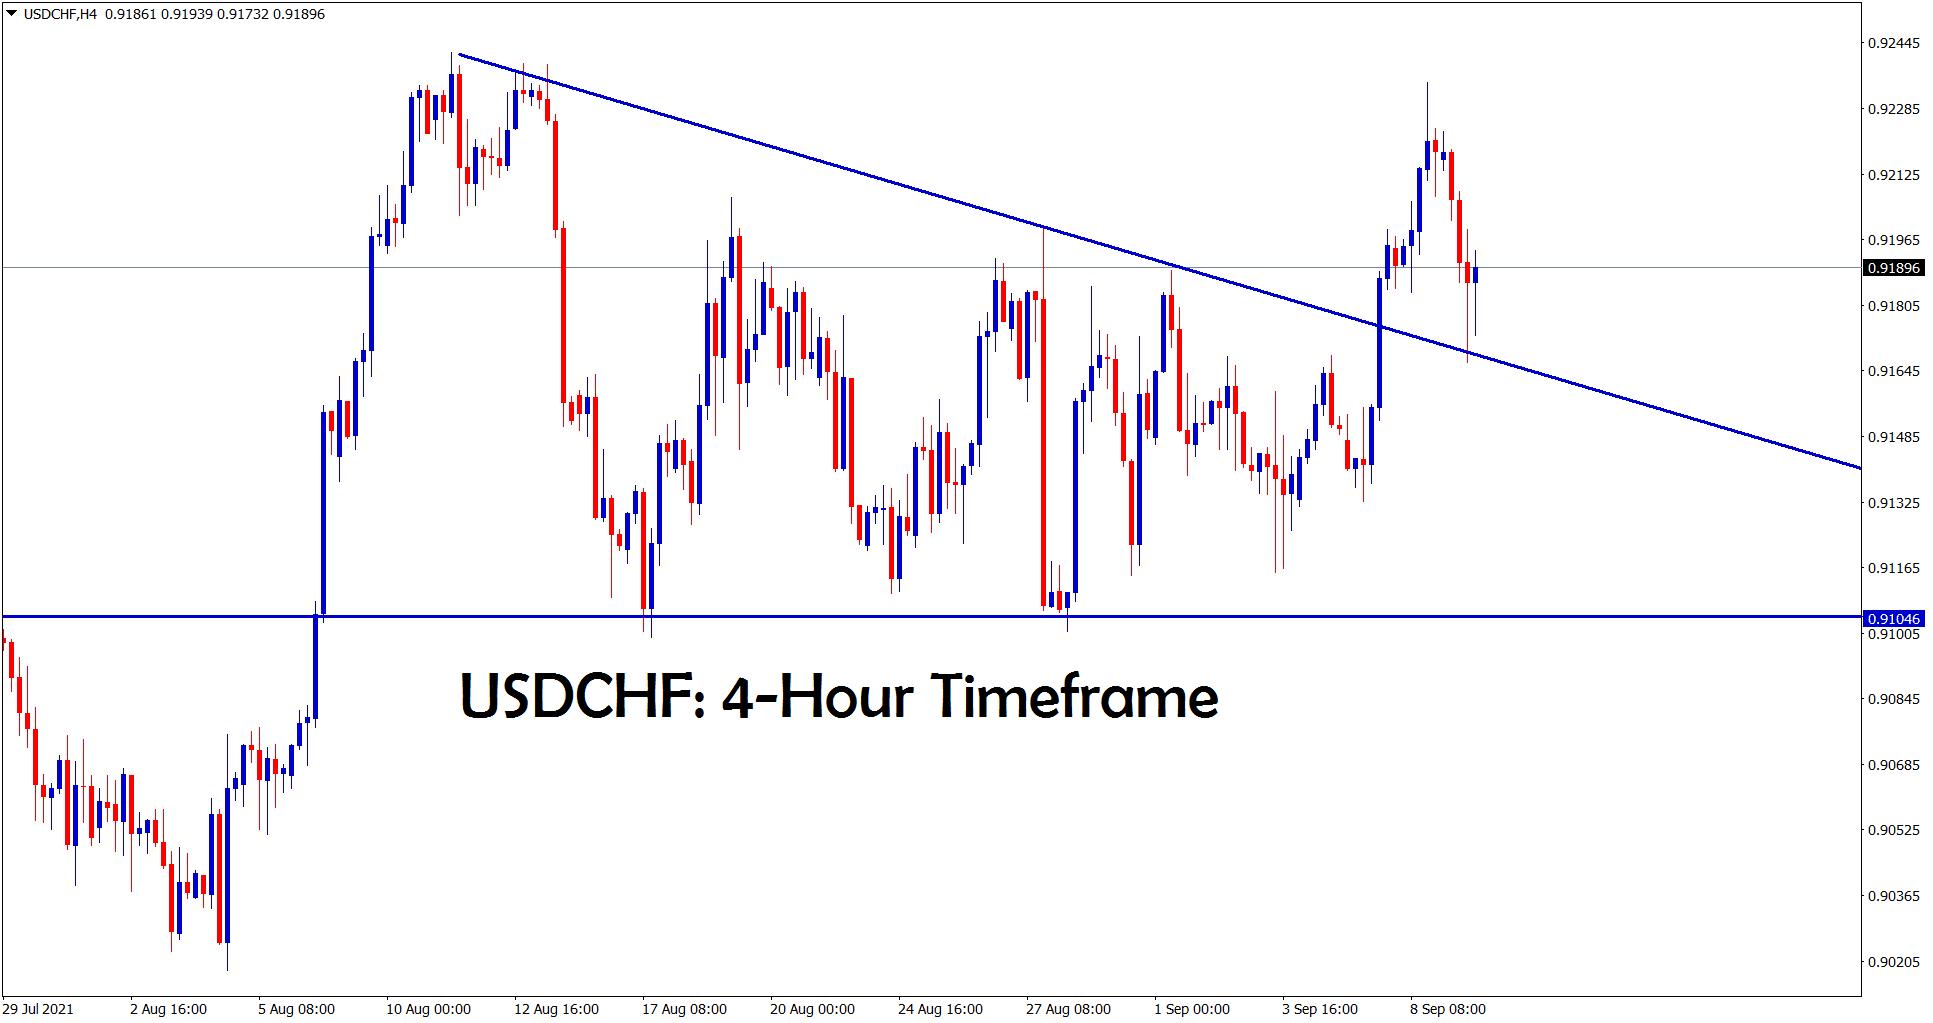 USDCHF is retesting the broken descending triangle pattern